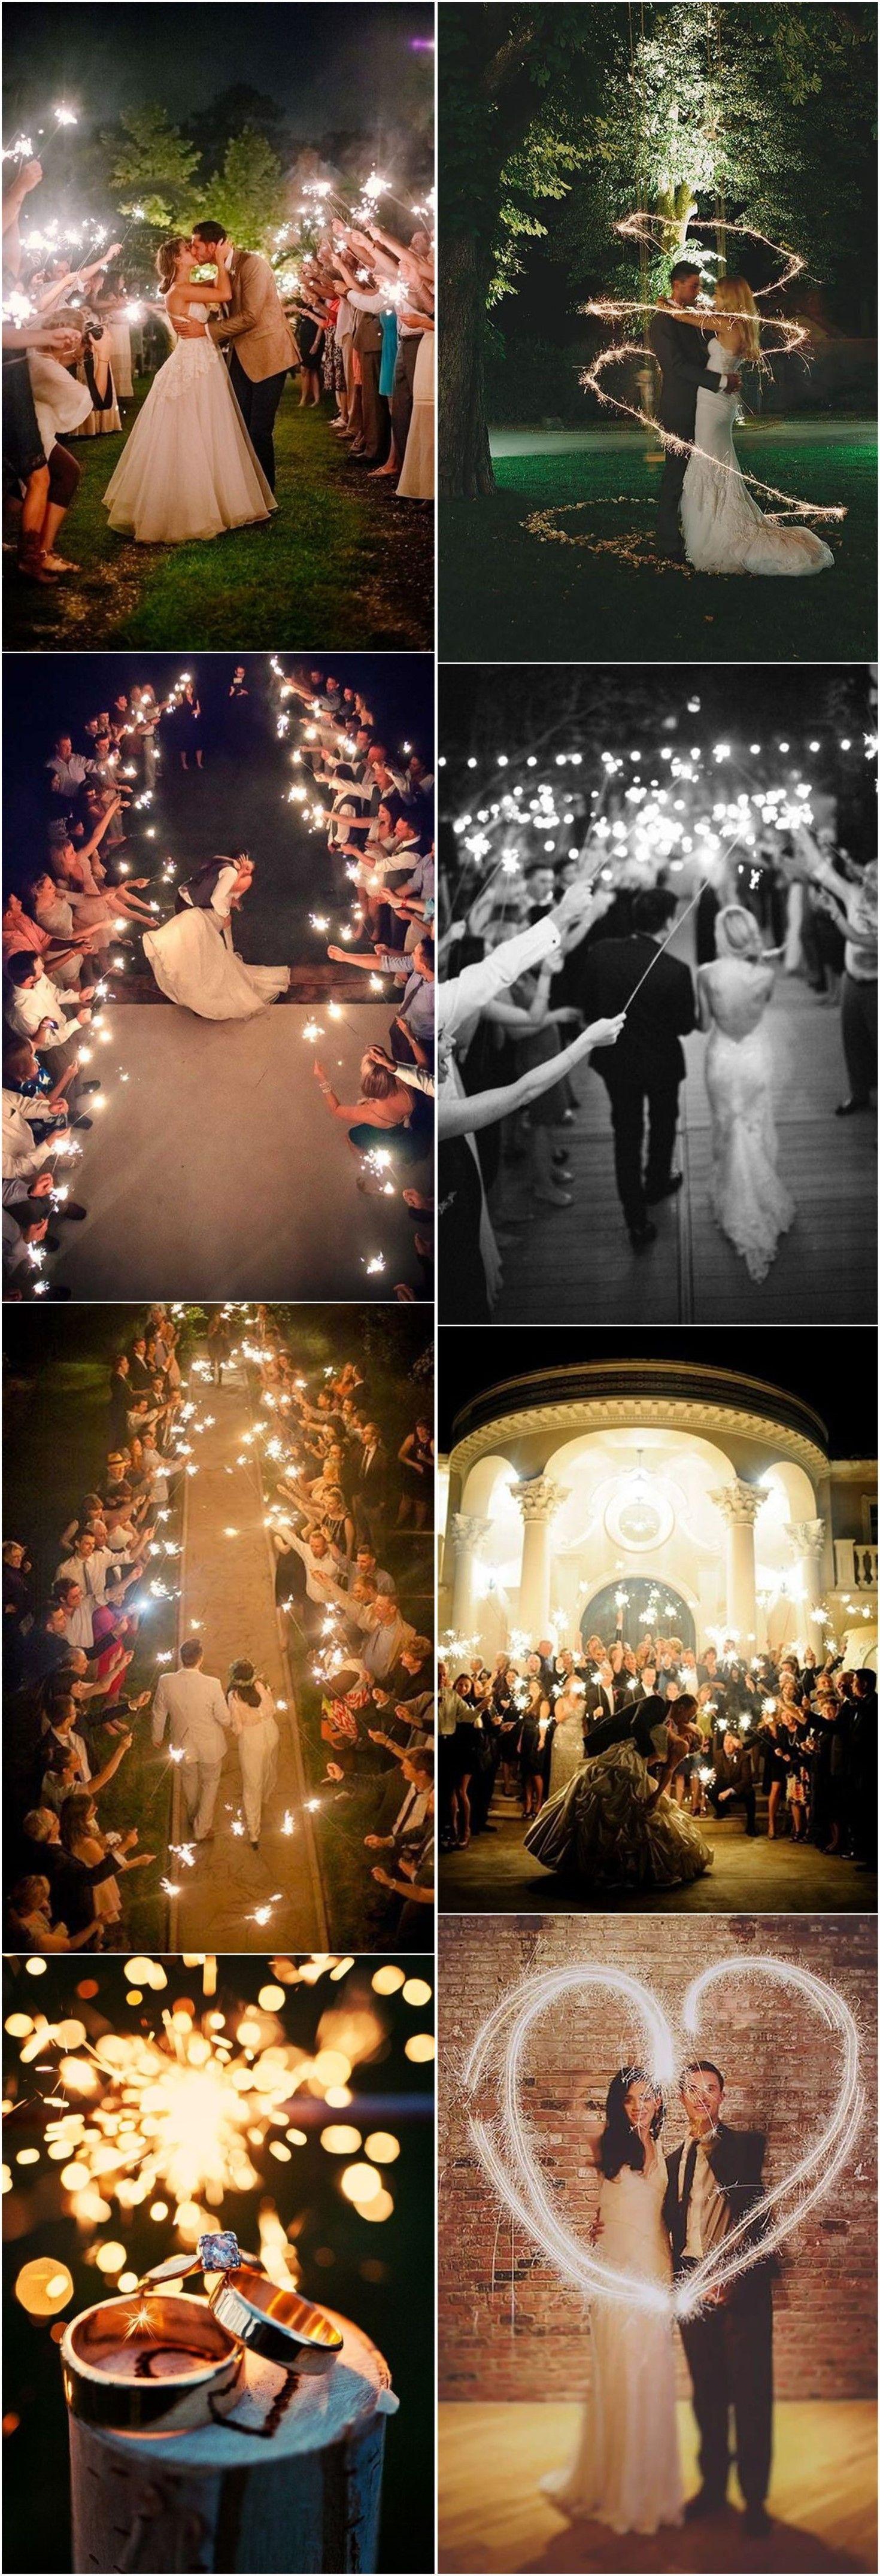 20 Magical Wedding Sparkler Send Off Ideas For Your Wedding Weddinginclude Magical Wedding Wedding Sparklers Wedding Photography